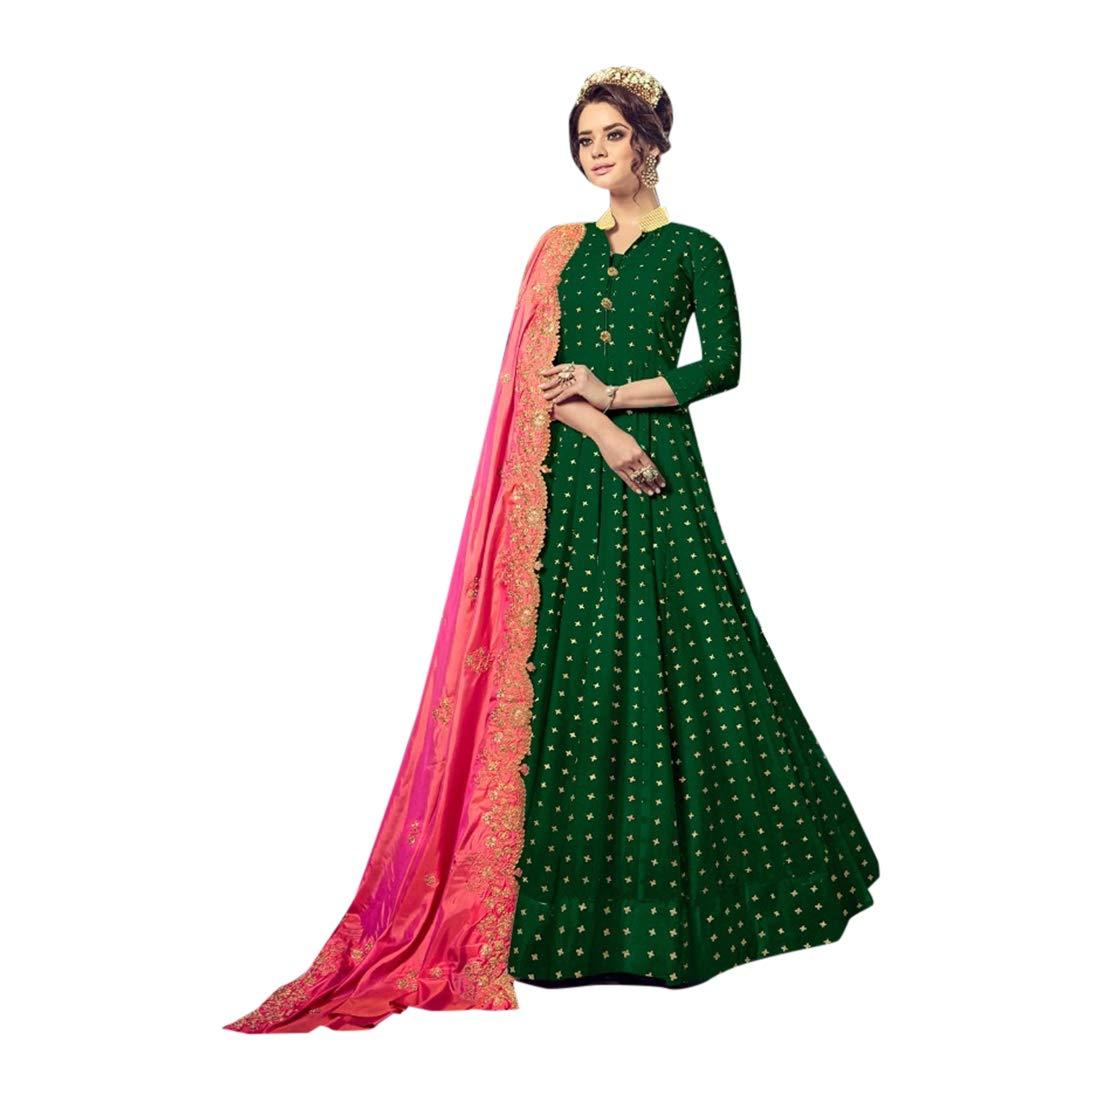 New Pure Cotton Anarkali Suit Indian Muslim Ethnic wear Festive Apparel(L,XL,XXL) 7210 5